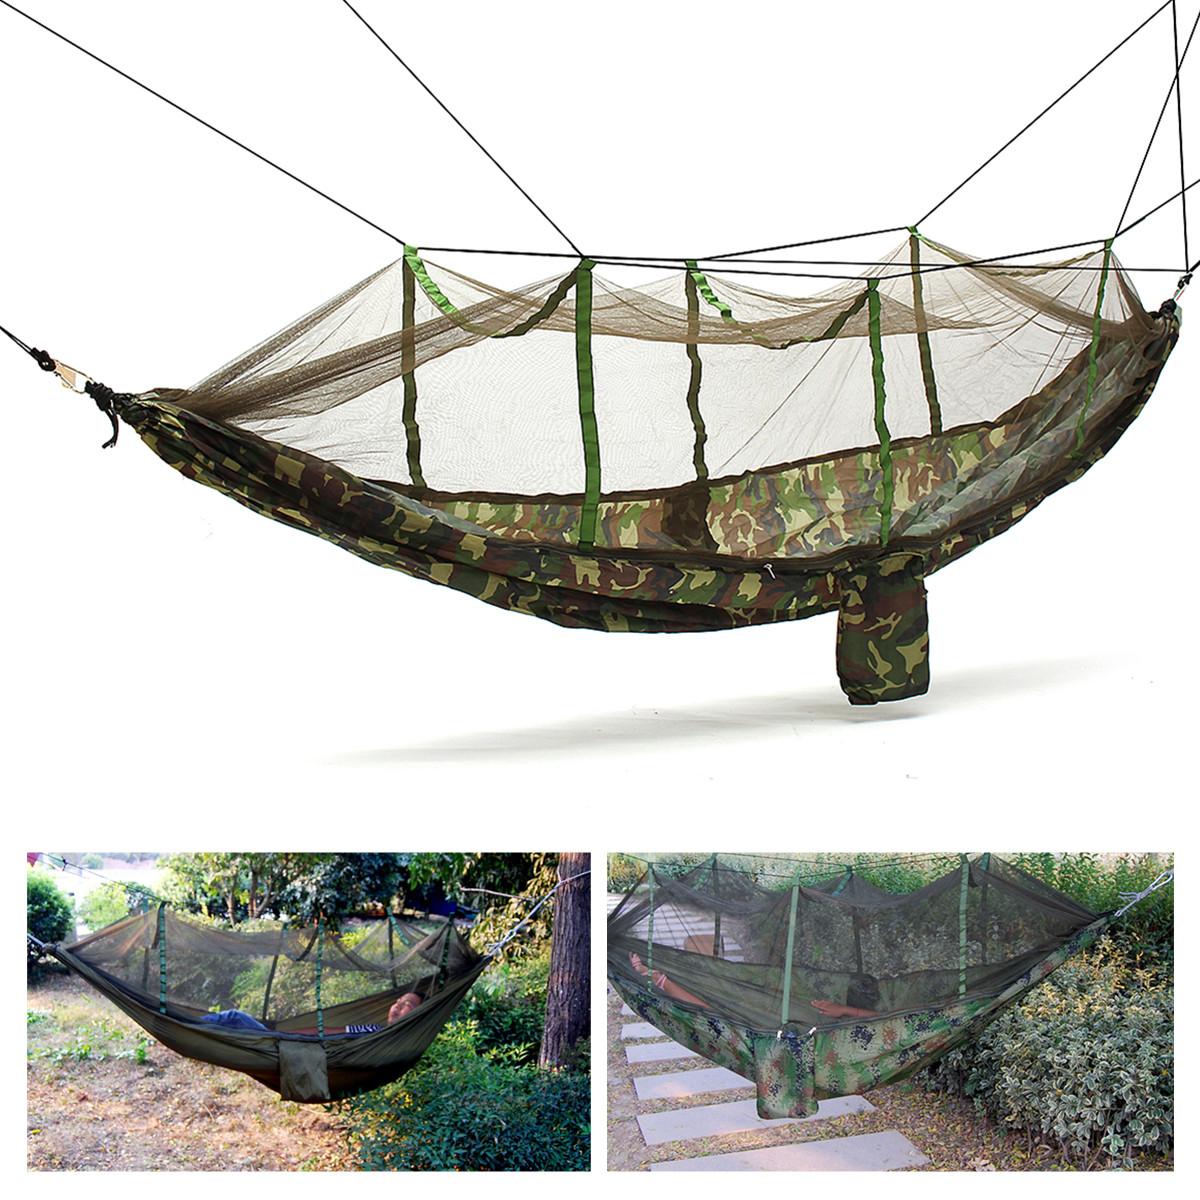 Ipree Outdoor Portable Camping Jungle Parachute Hammock